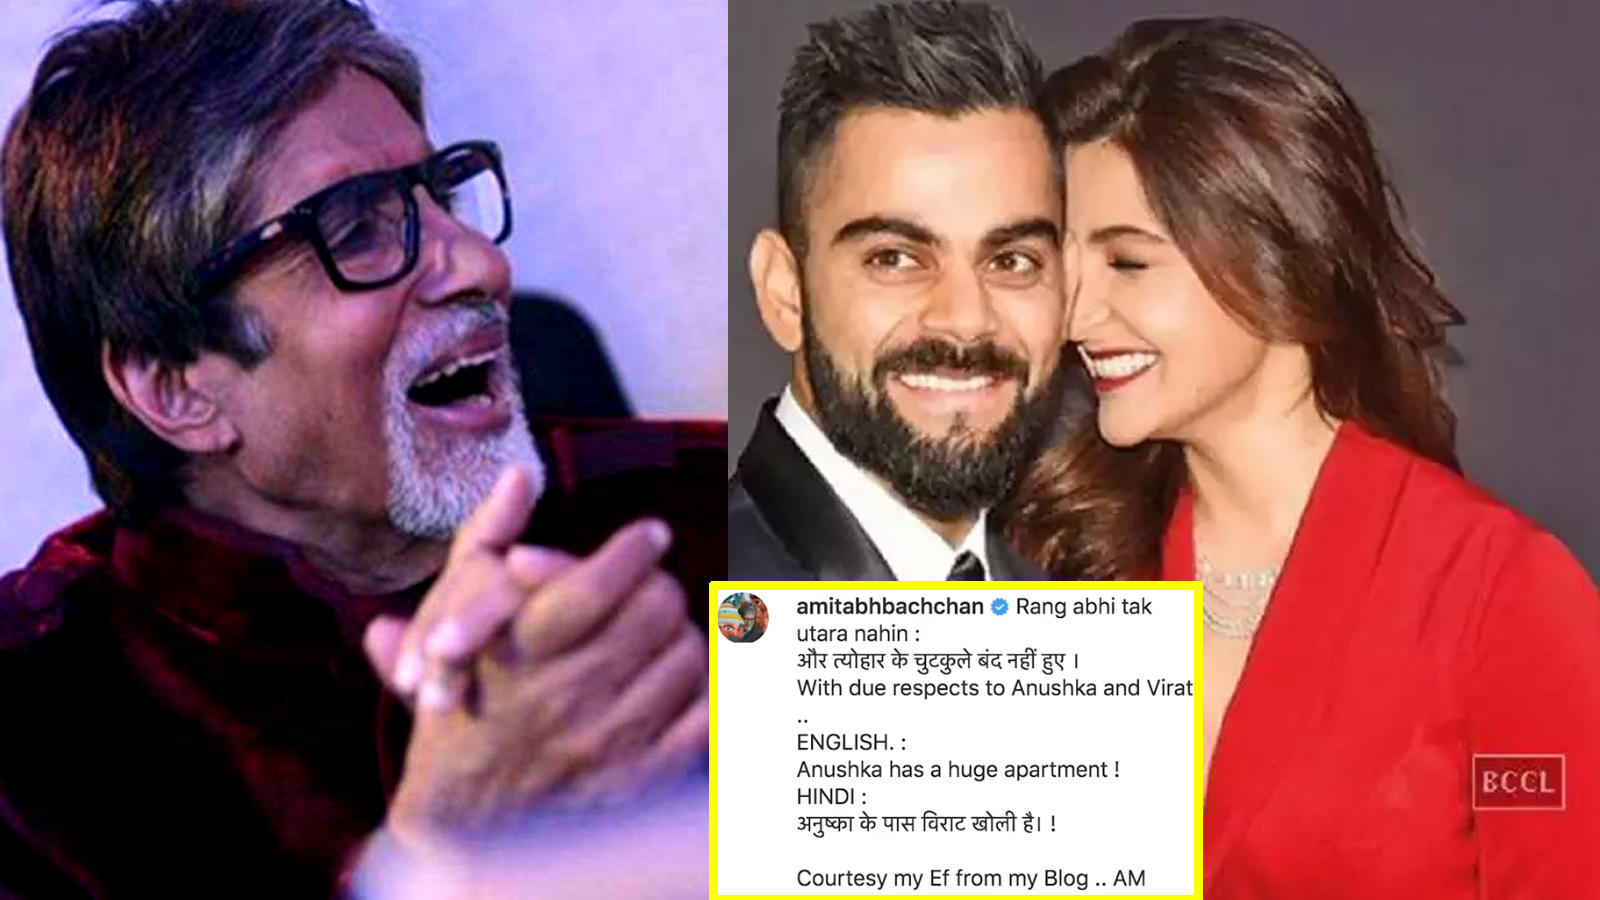 Amitabh Bachchan cracks a joke 'with due respect to Anushka Sharma-Virat Kohli' leaving fans into splits | Hindi Movie News – Bollywood – Times of India